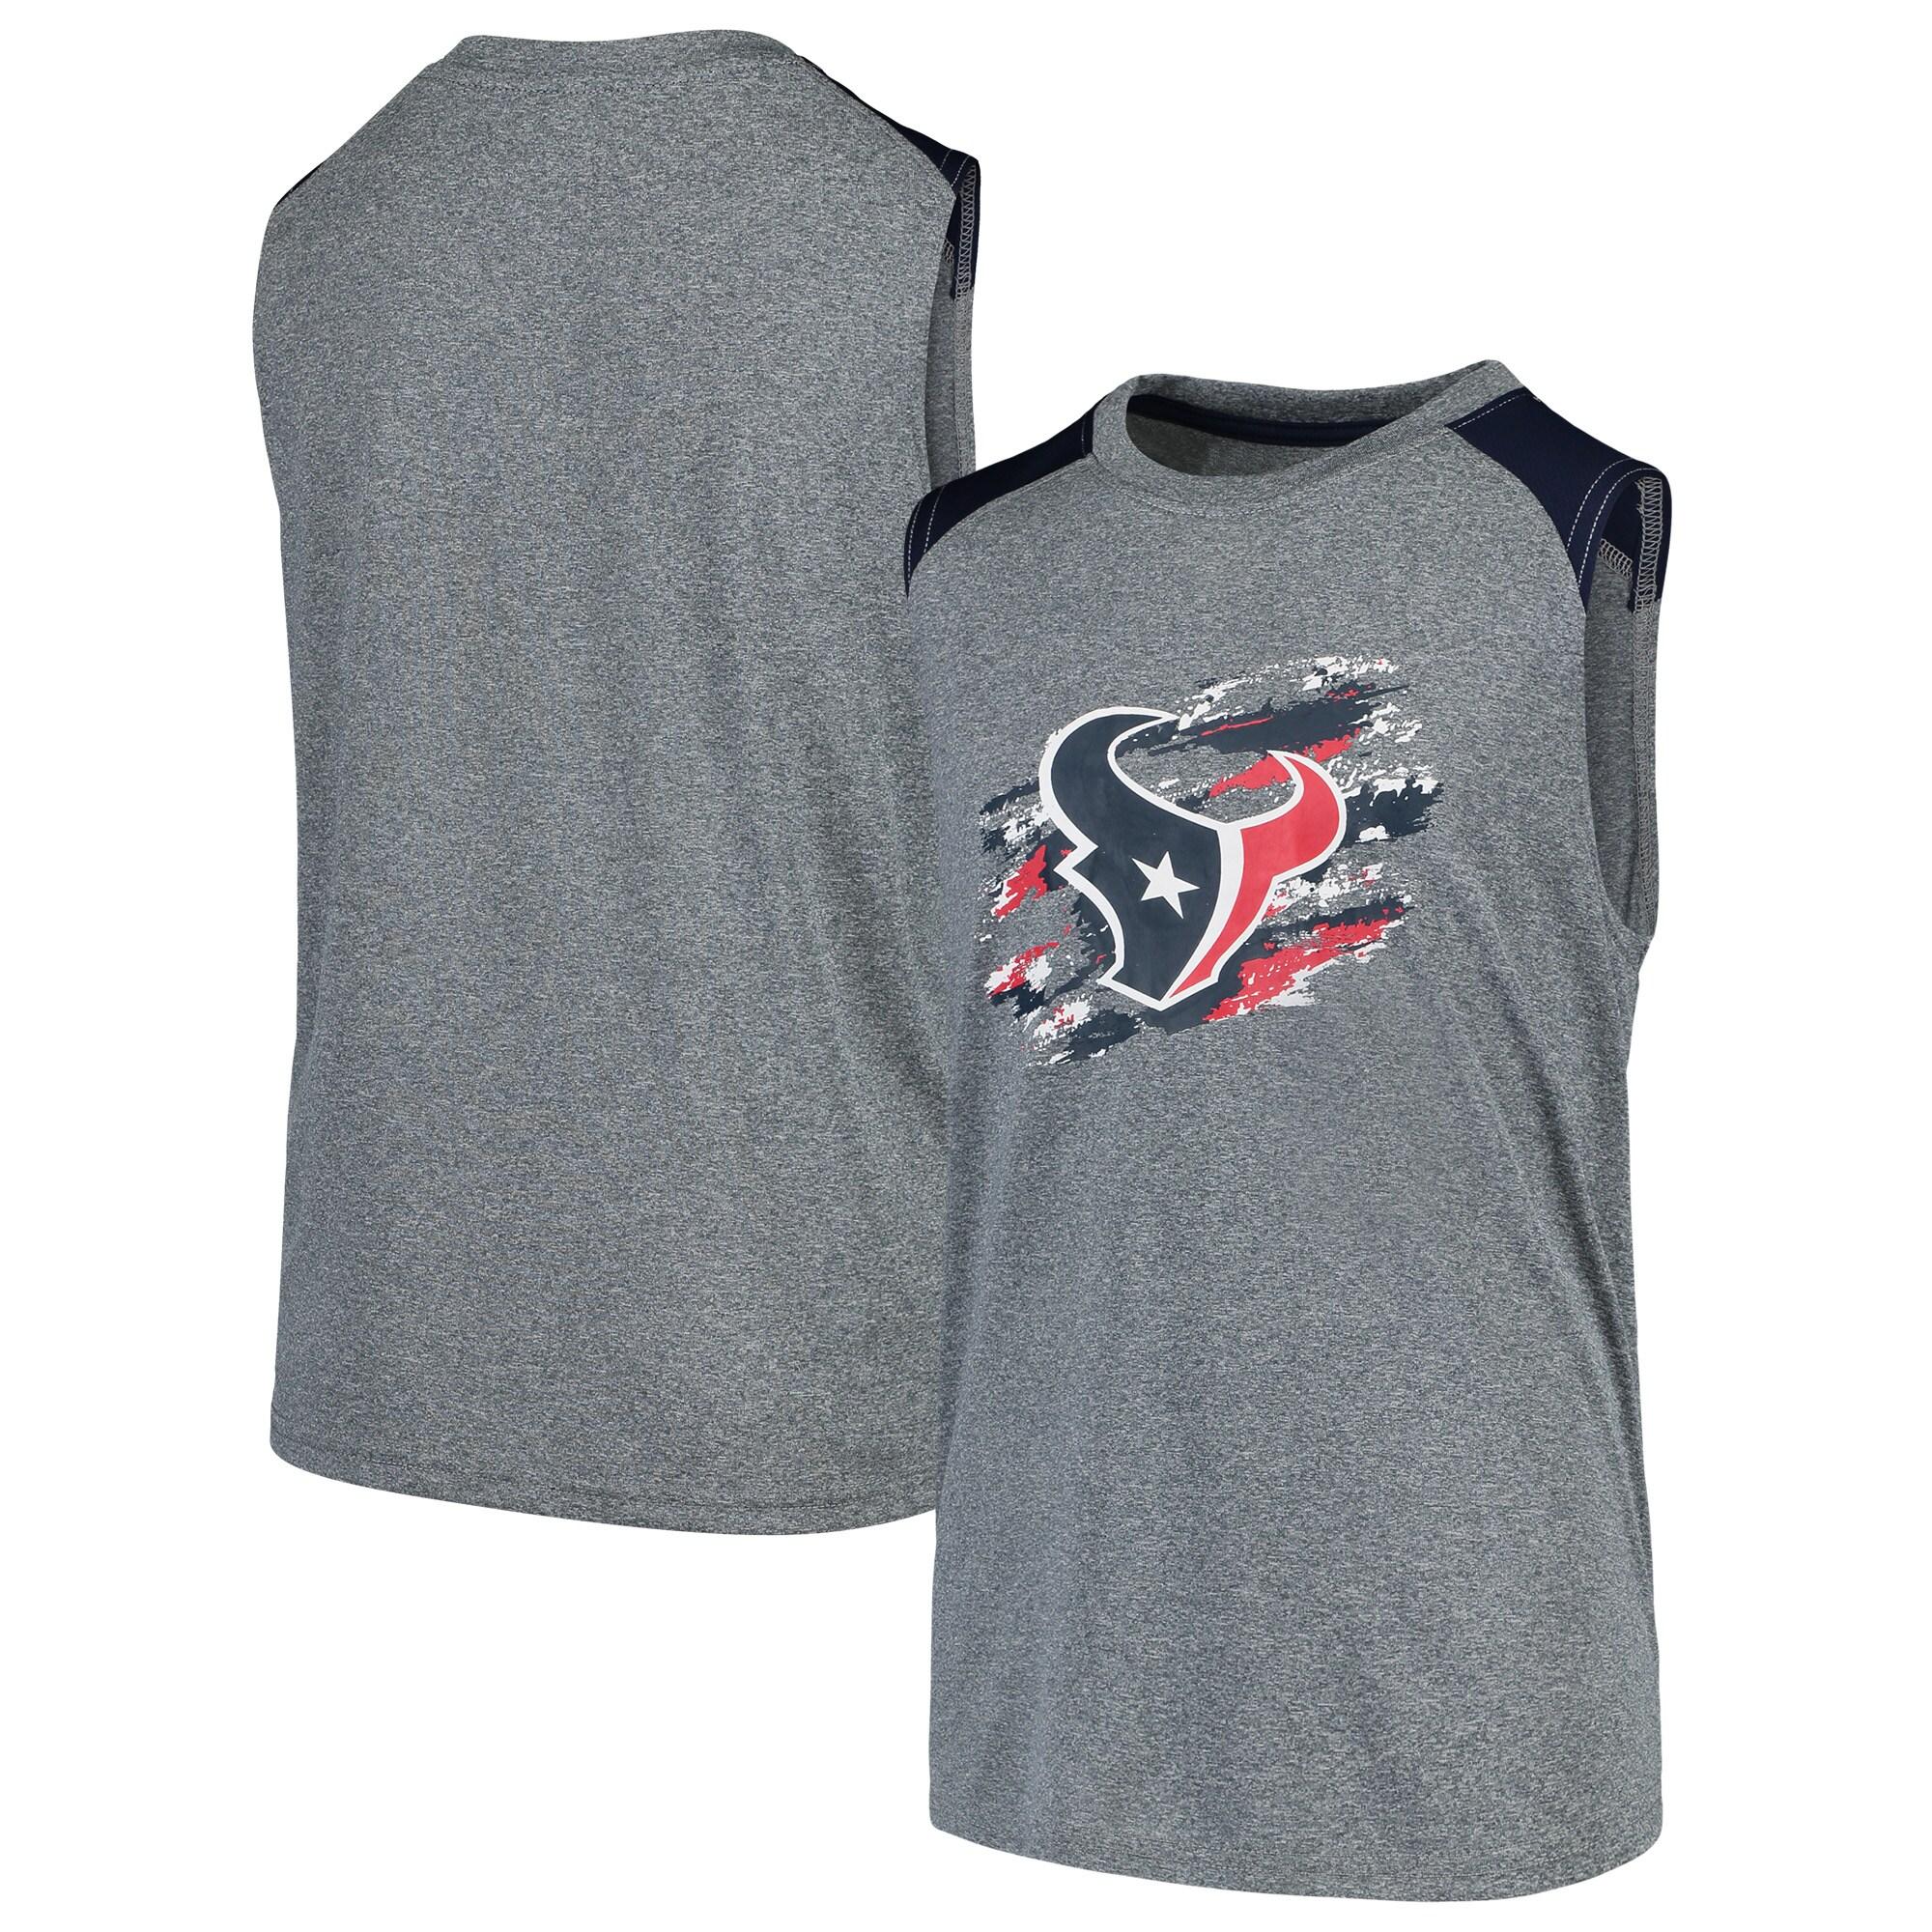 Houston Texans NFL Pro Line by Fanatics Branded Youth True Colors Sleeveless T-Shirt - Heathered Gray